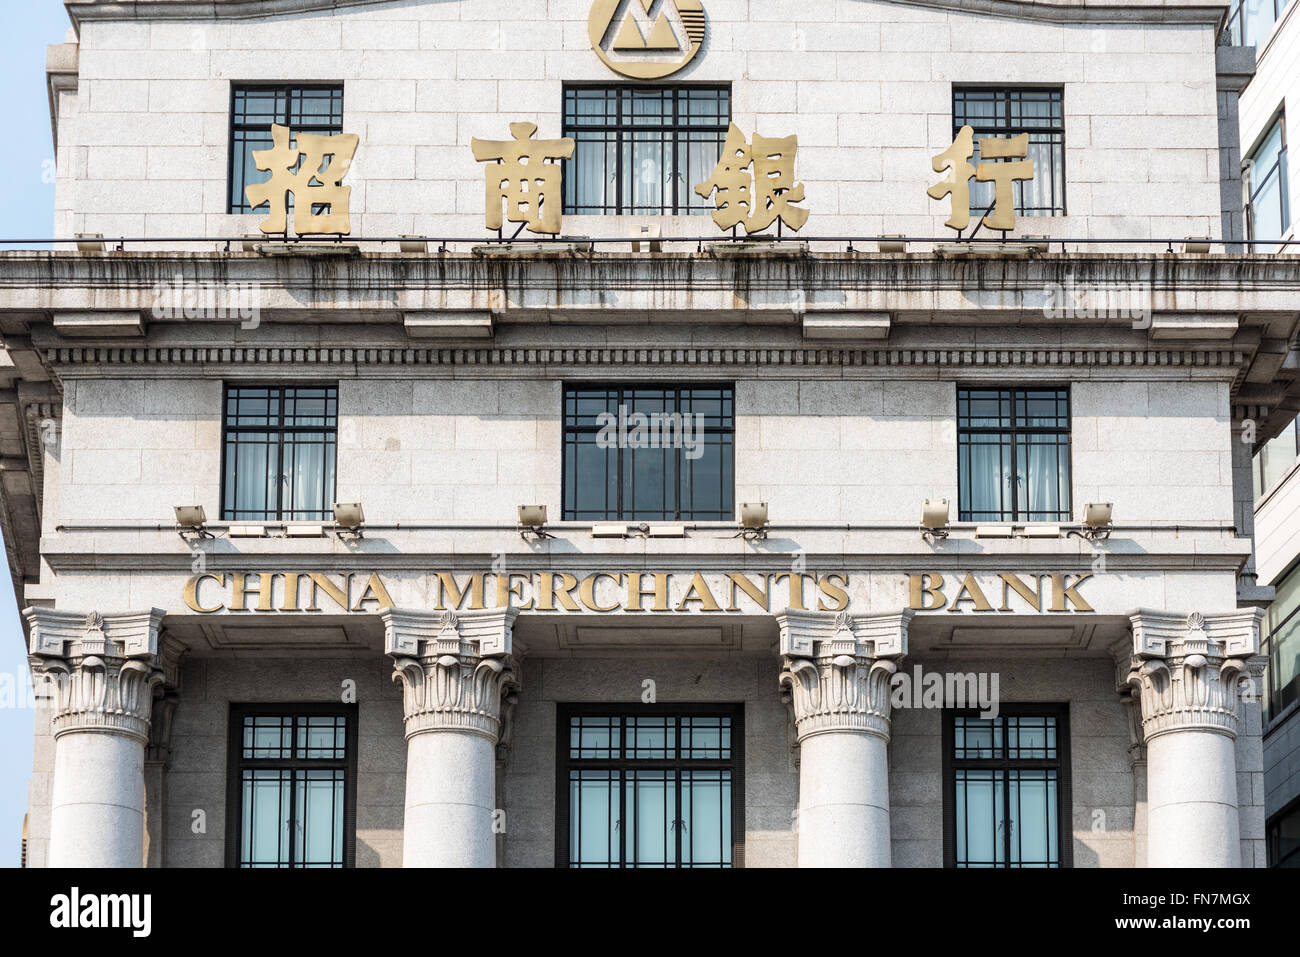 China Merchants Bank building on the Bund in Shanghai, China - Stock Image